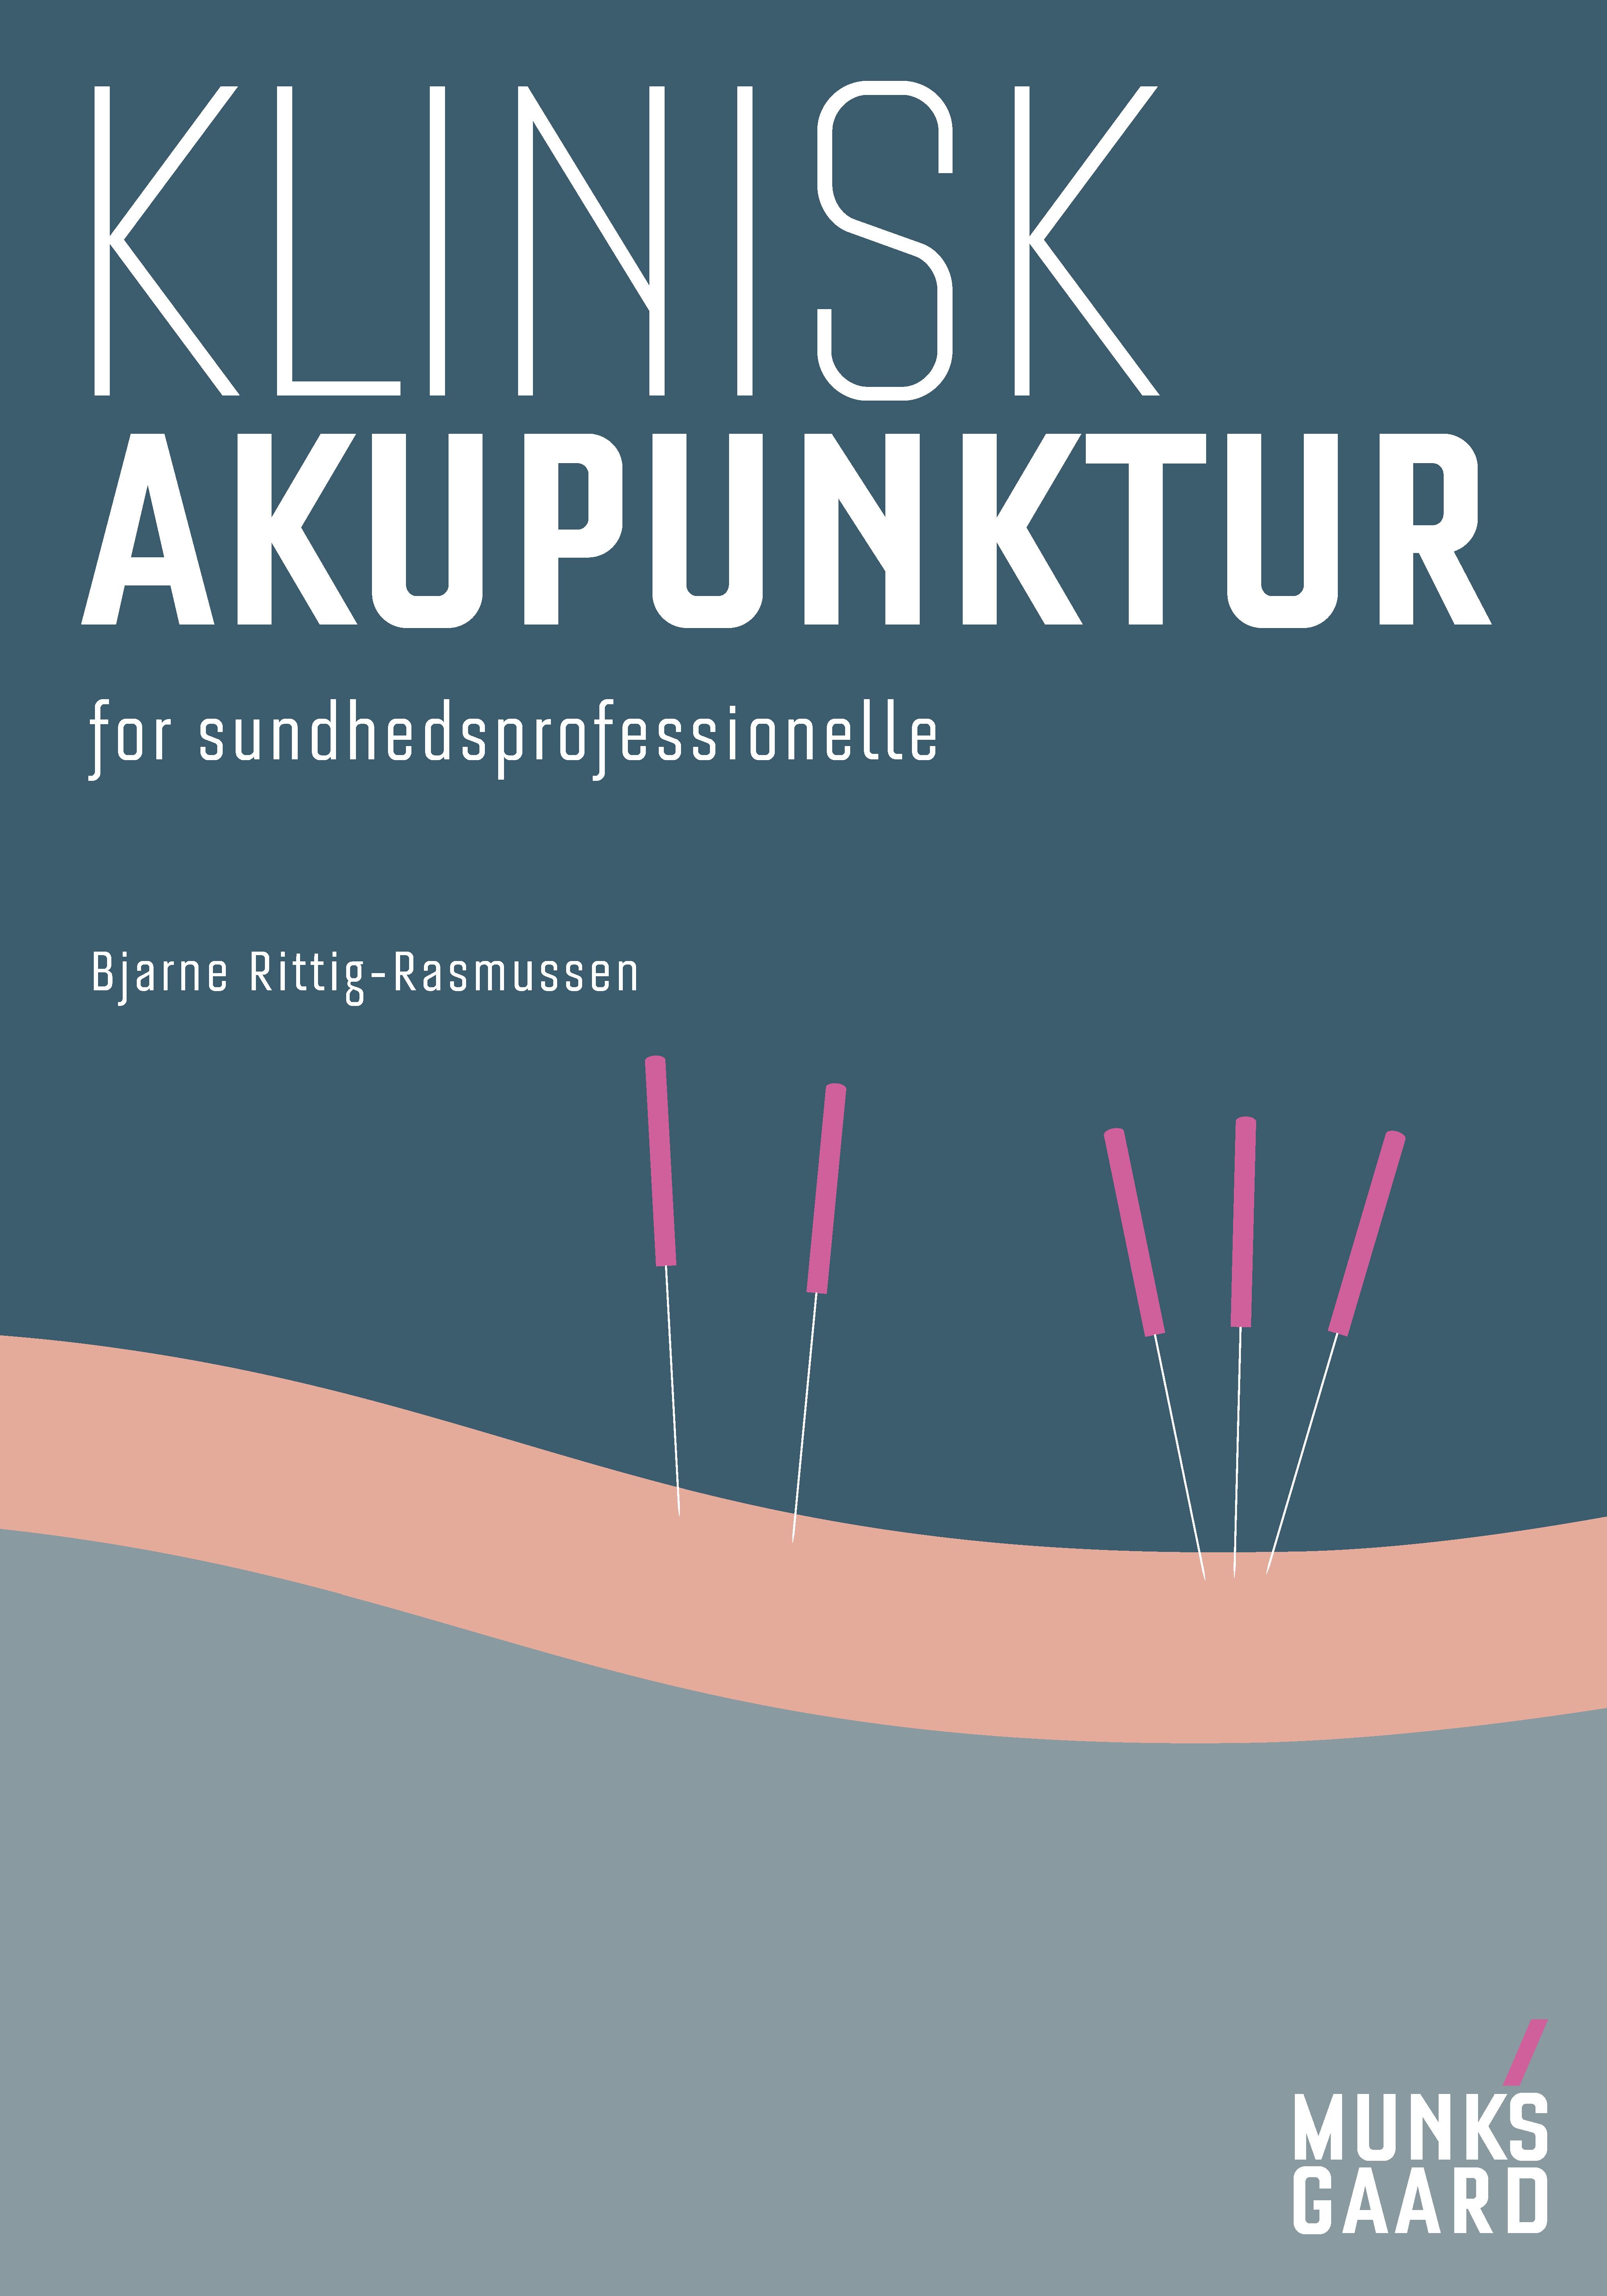 Klinisk akupunktur